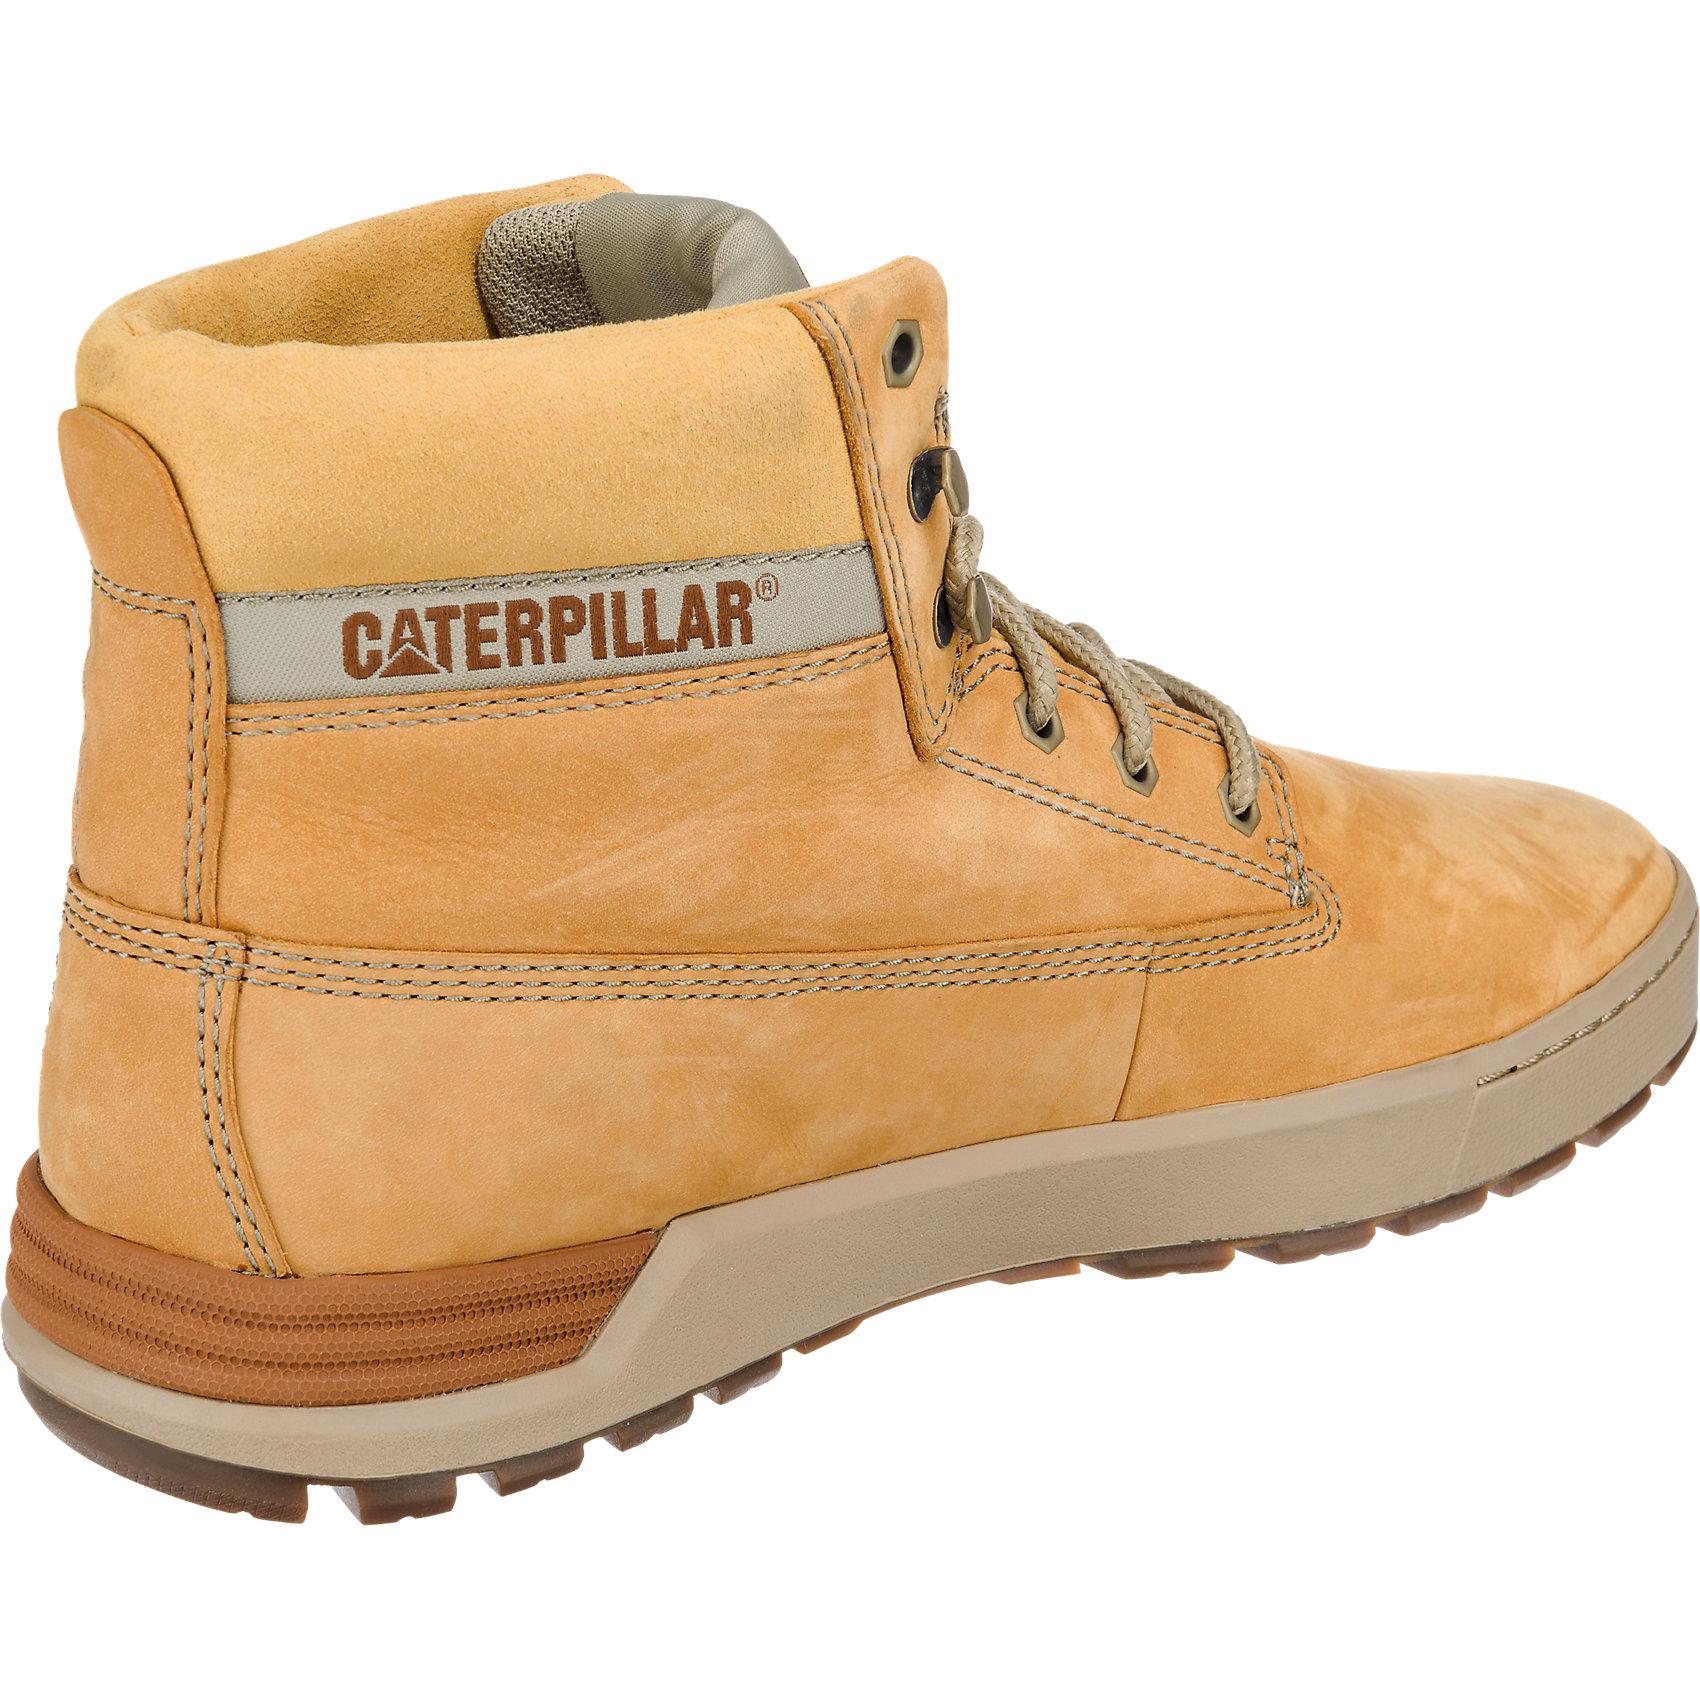 Neu CATERPILLAR Herren Ryker Stiefeletten 5773344 für Herren CATERPILLAR camel 8214dd